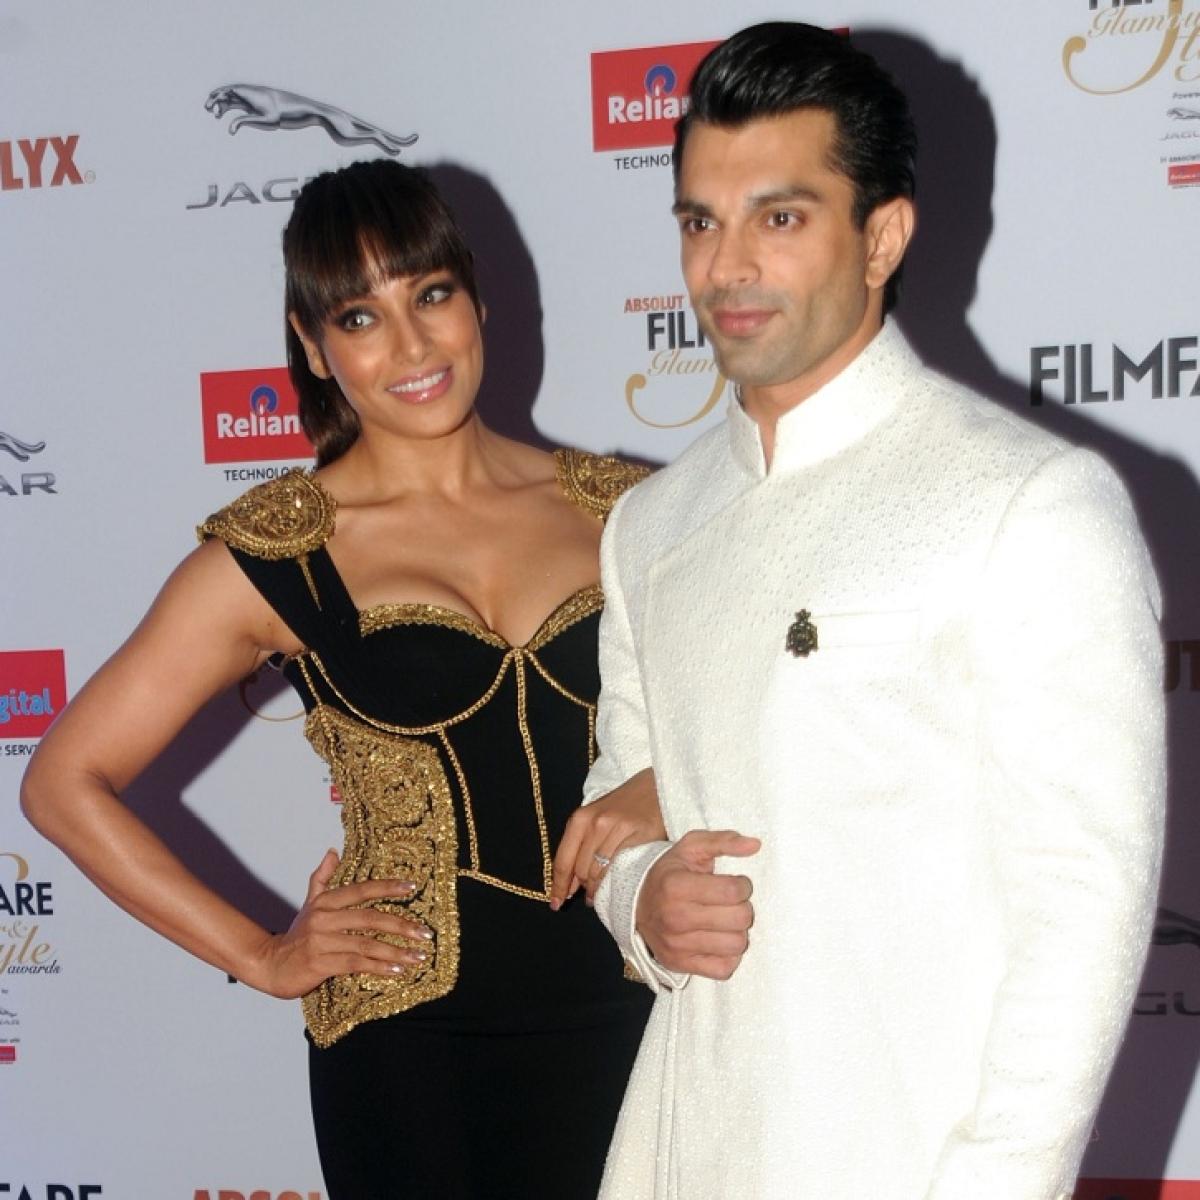 'Intimate scenes with Karan are easier,' says Bipasha Basu